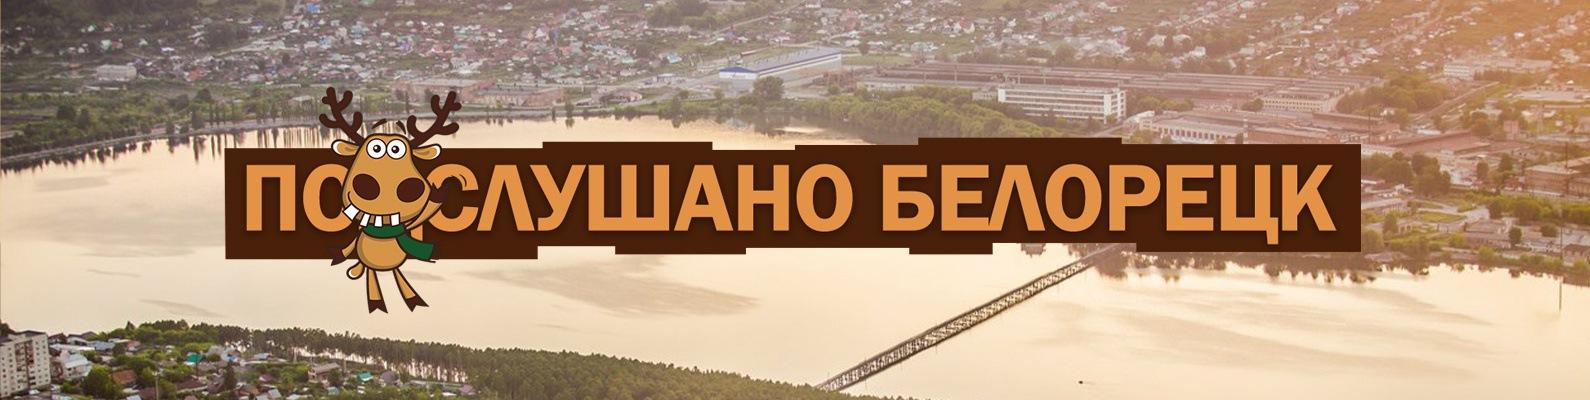 В контакте белорецк знакомство